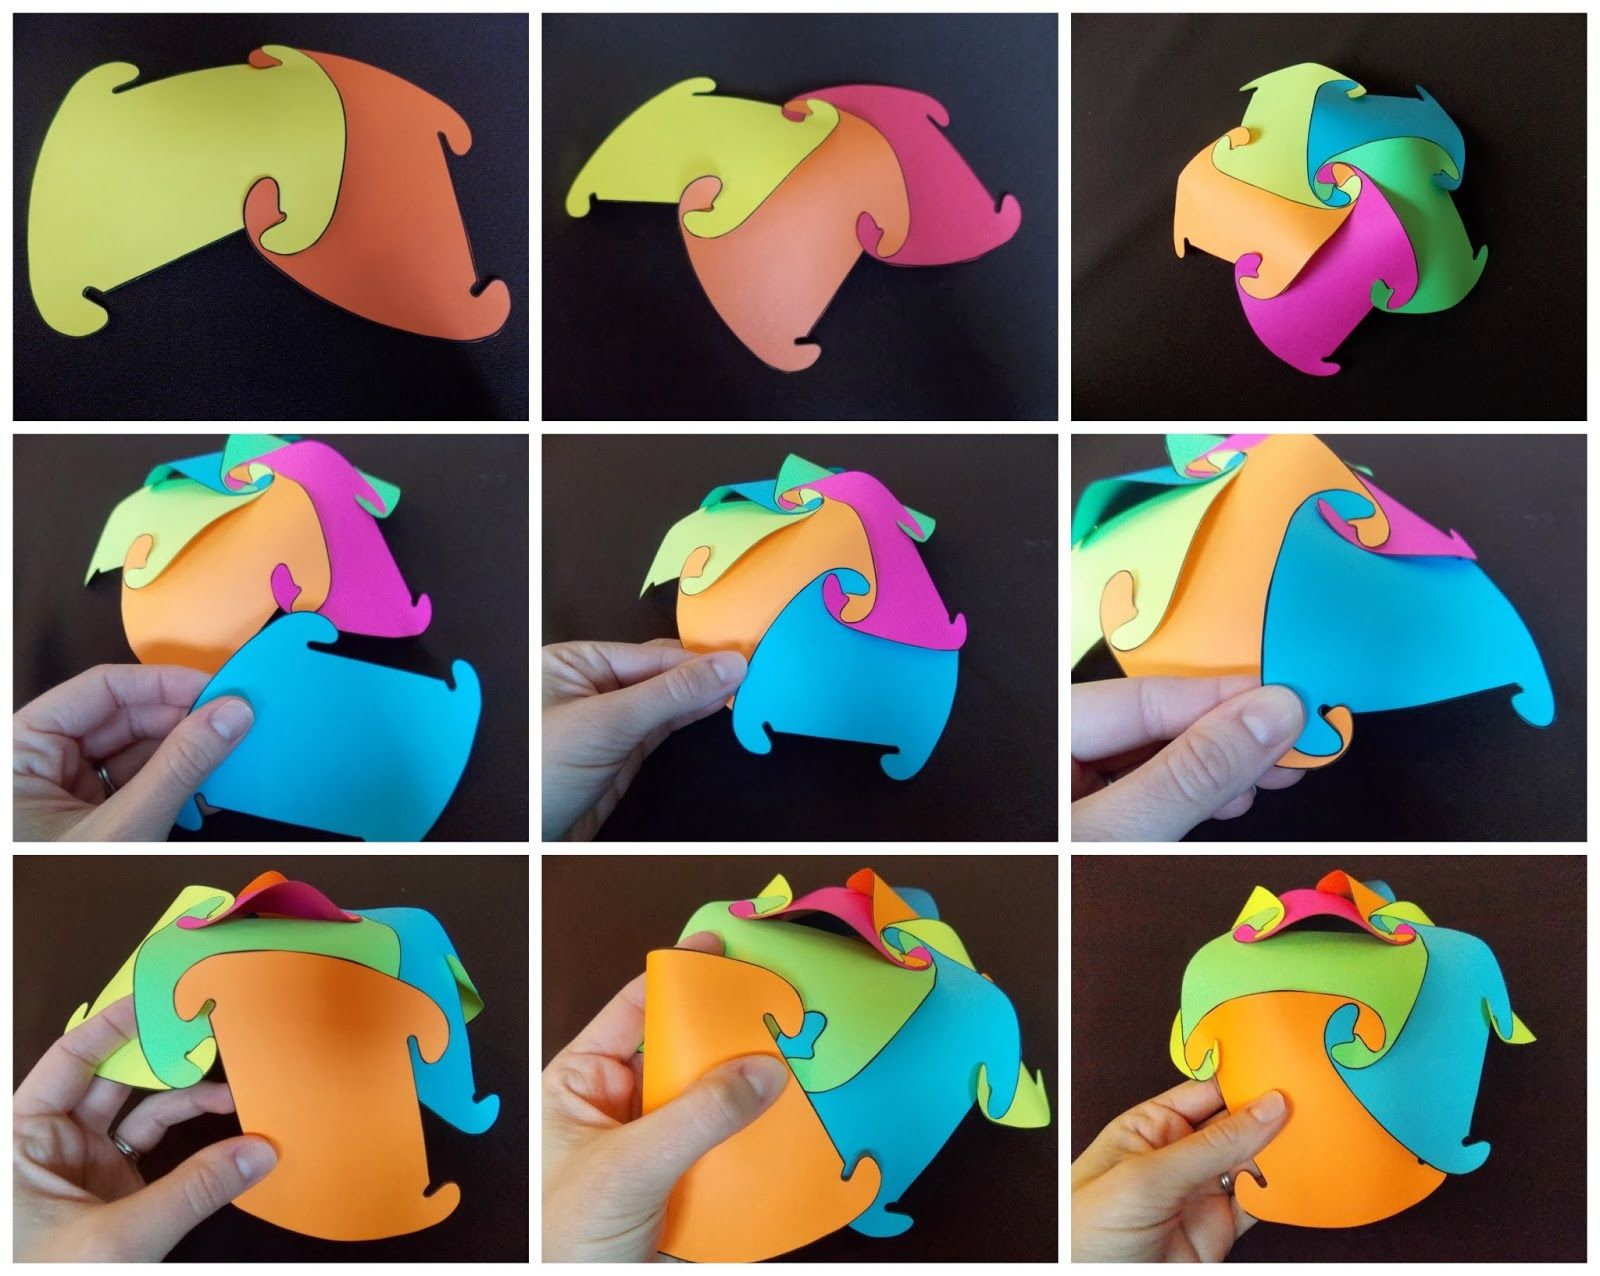 2.bp.blogspot.com -xgJbIx6Aalg Uw1e-eEVHwI AAAAAAAAFWg P_WPBK7vo_c s1600 Paper+Polyhedron+in+progress.jpg